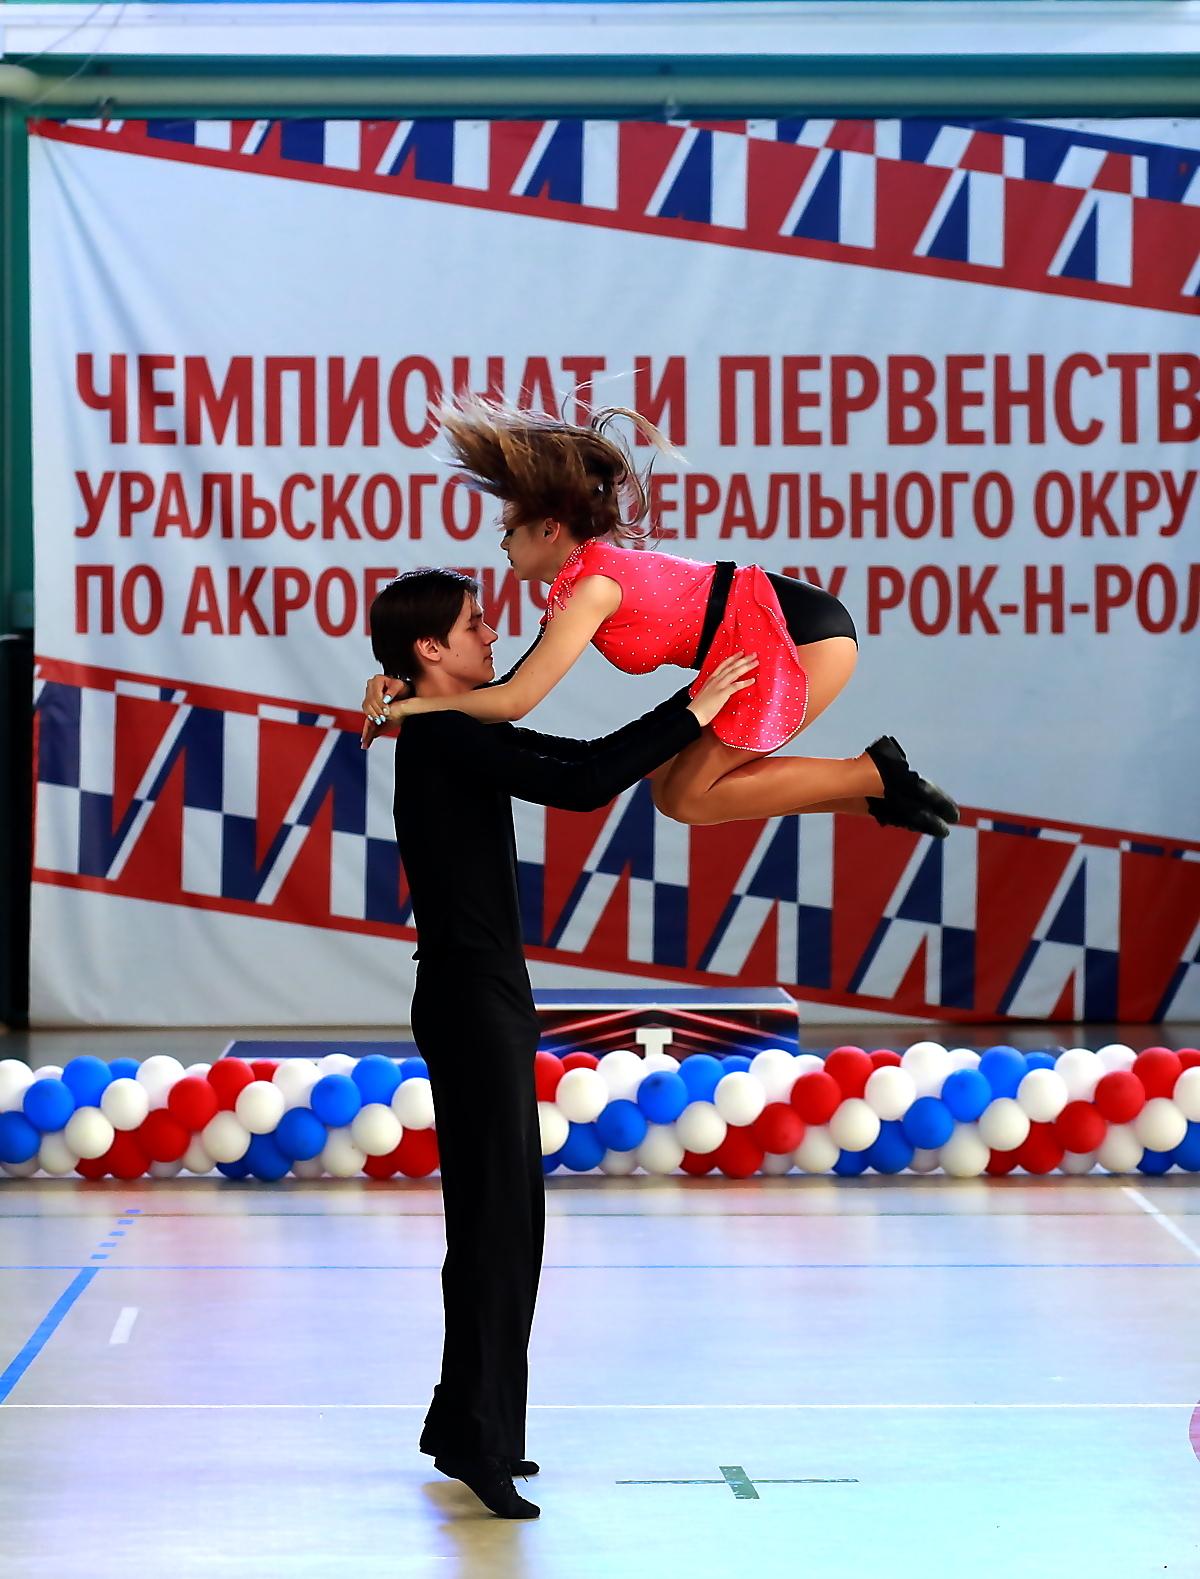 акробатический рок-н-ролл, танец, спорт